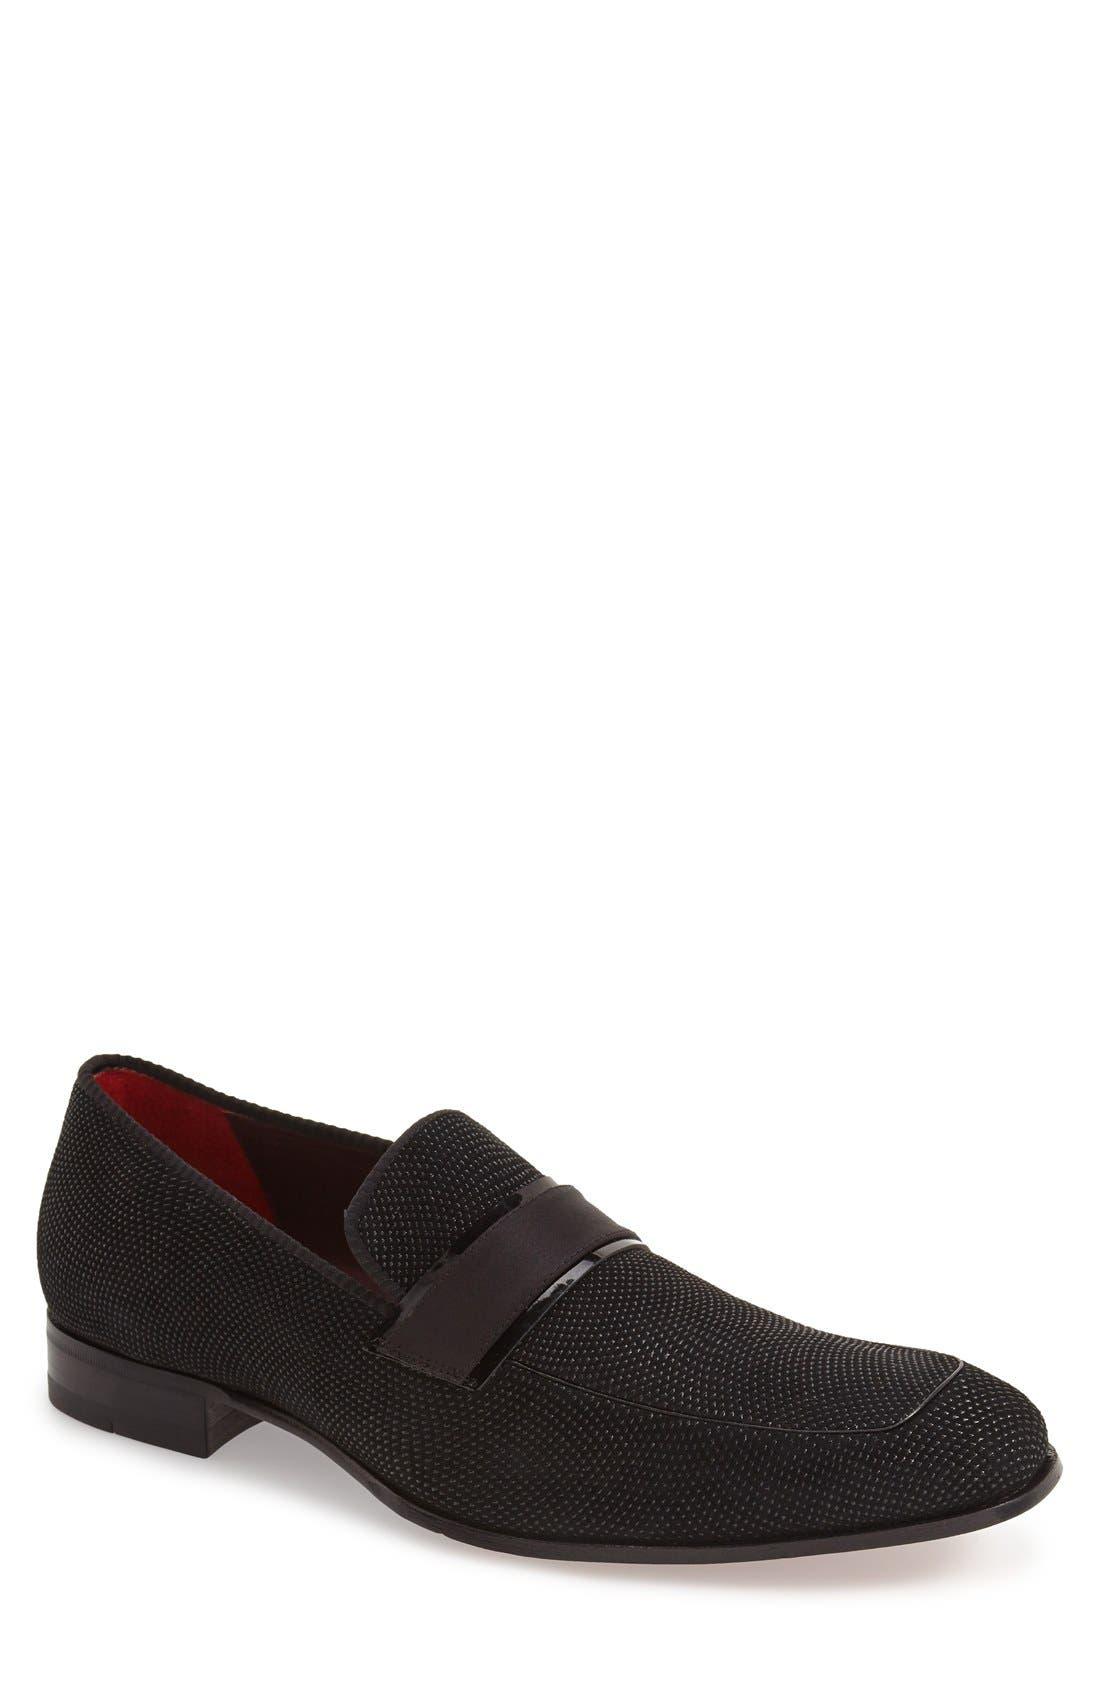 'Capizzi' Venetian Loafer,                         Main,                         color, BLACK